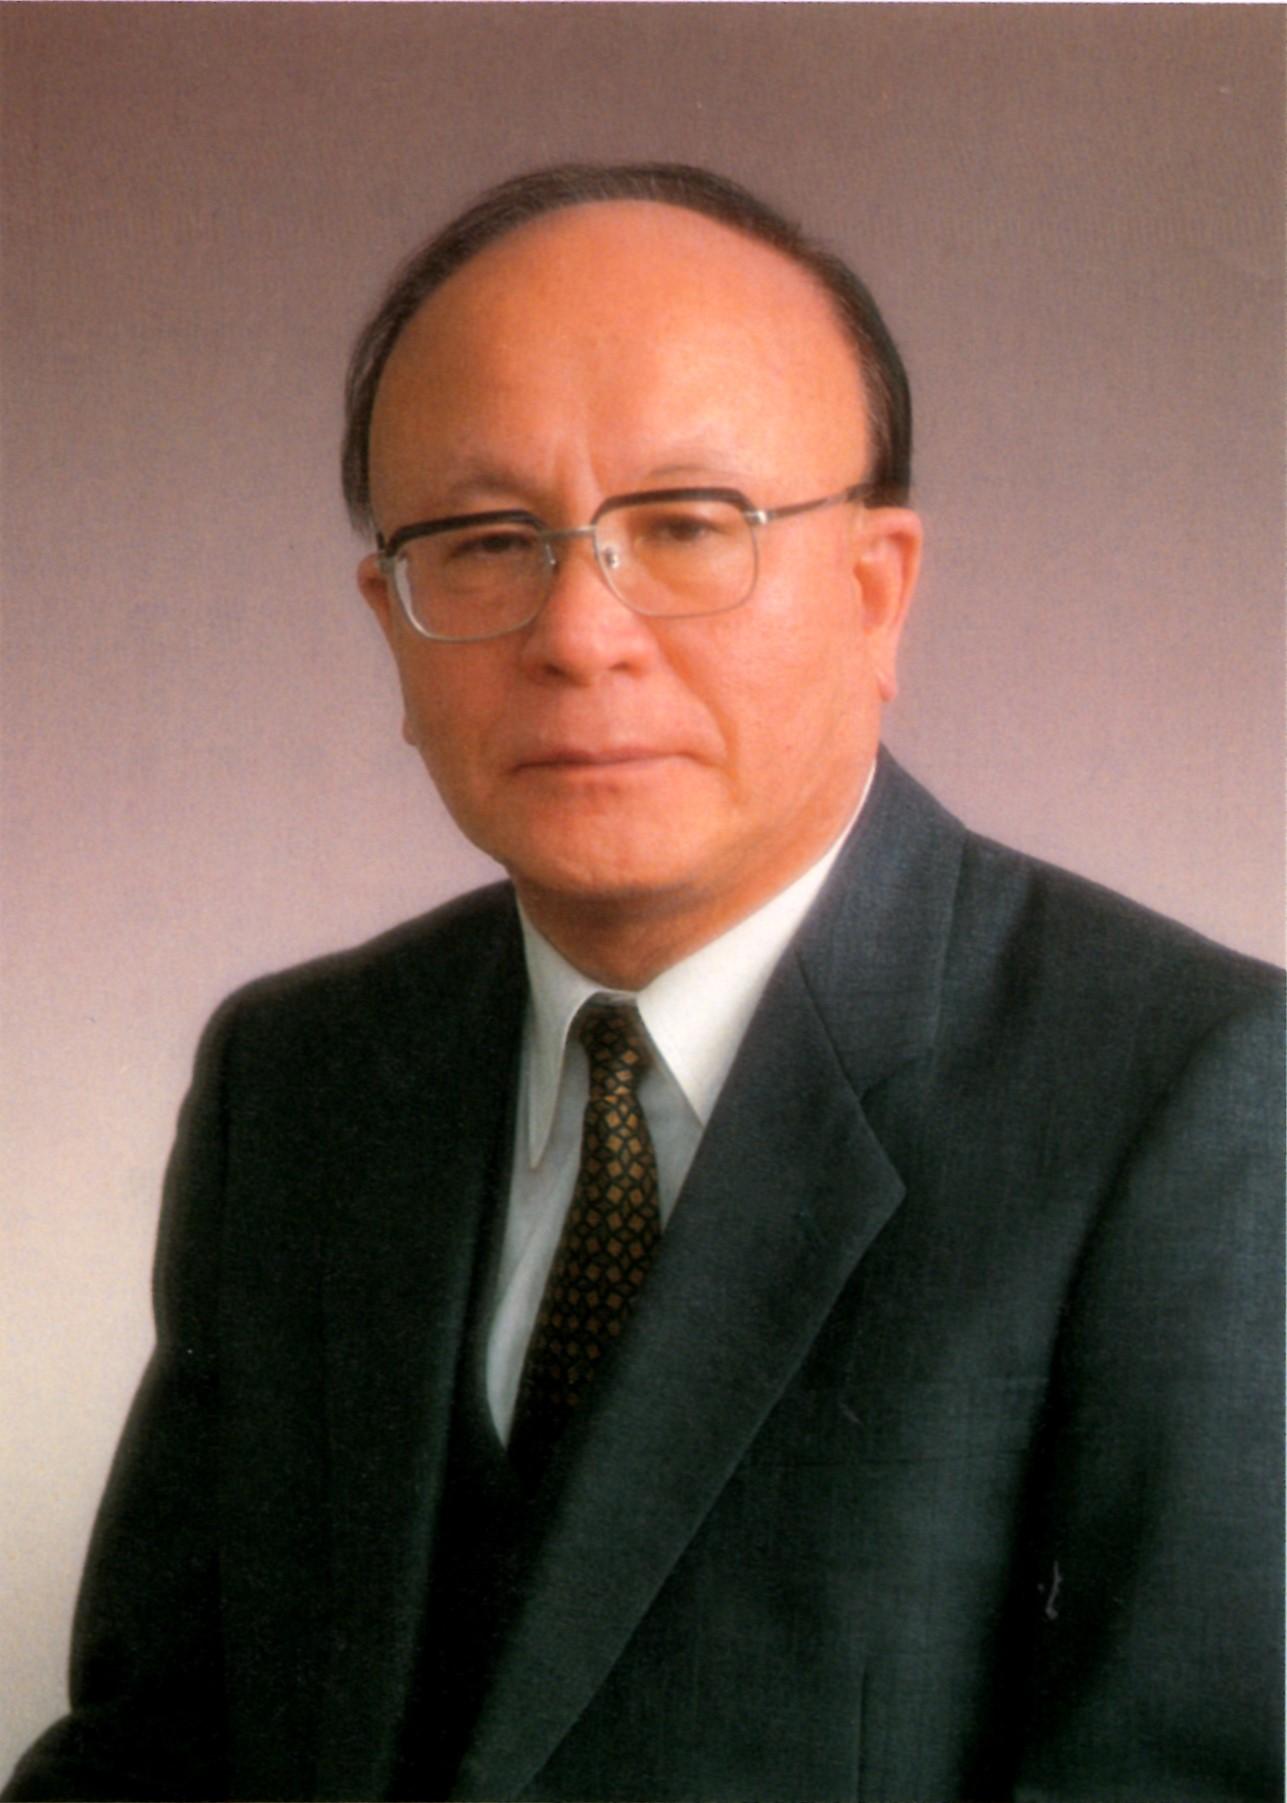 Kenji Tasaka